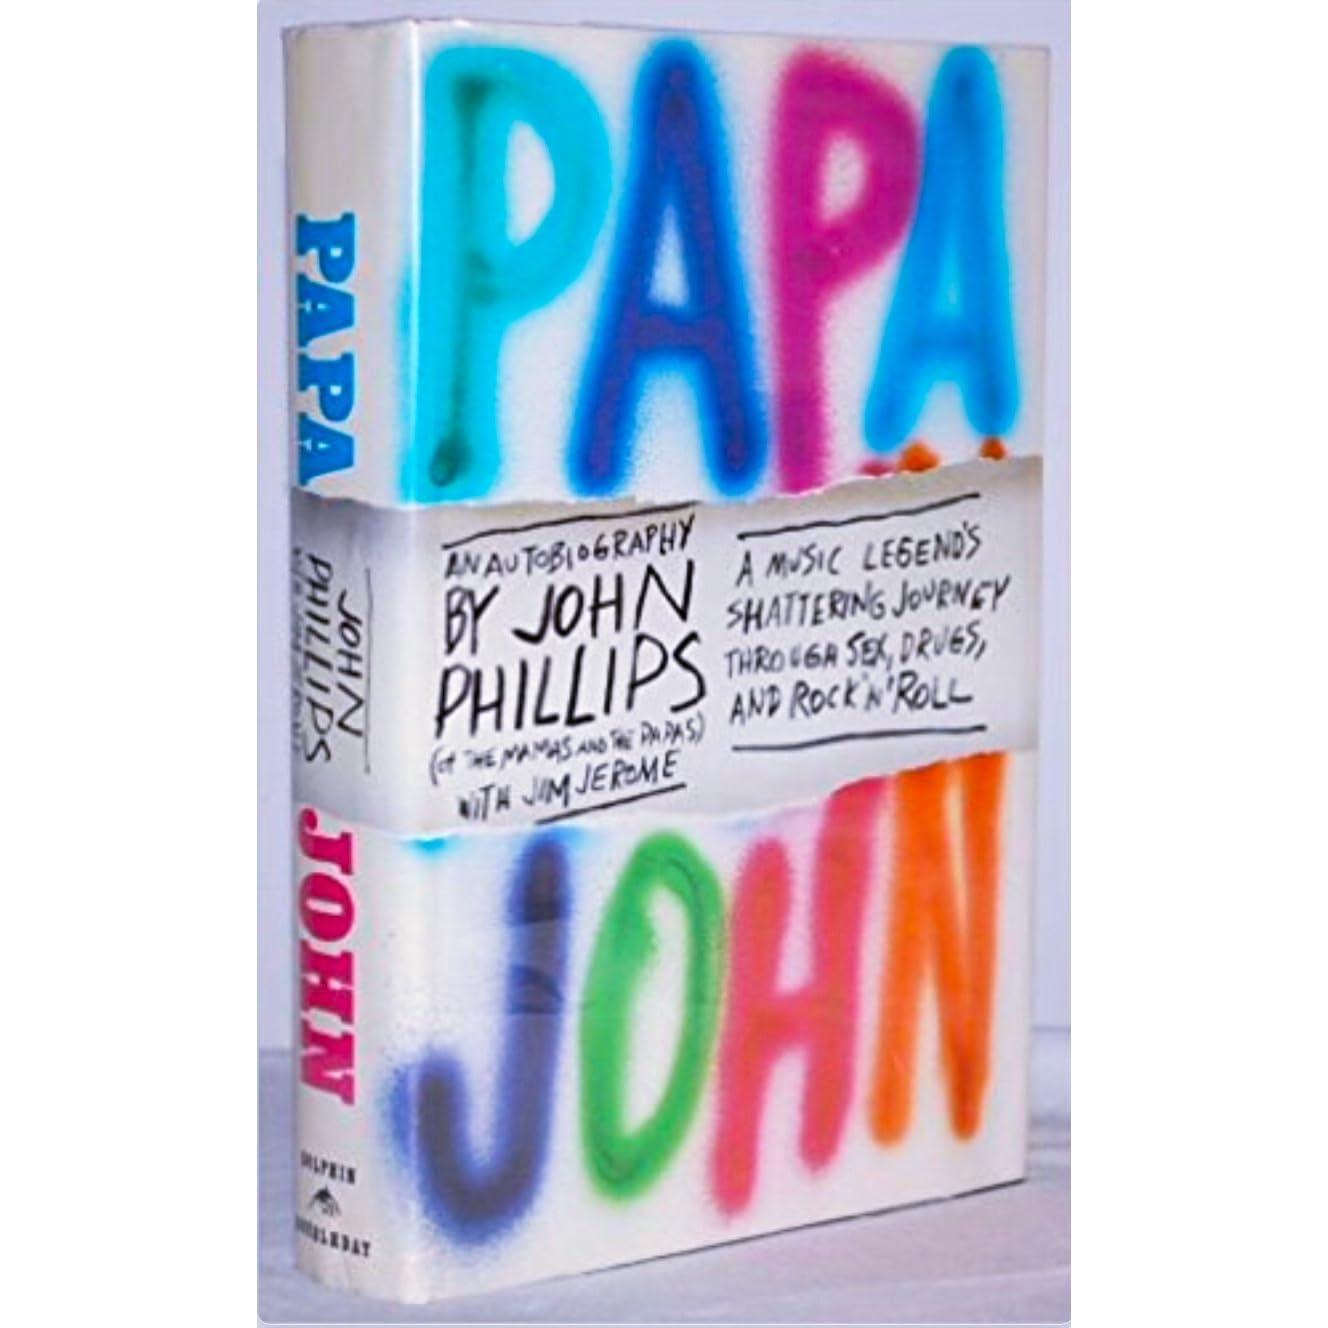 Papa John: An Autobiography by John Phillips by John Phillips